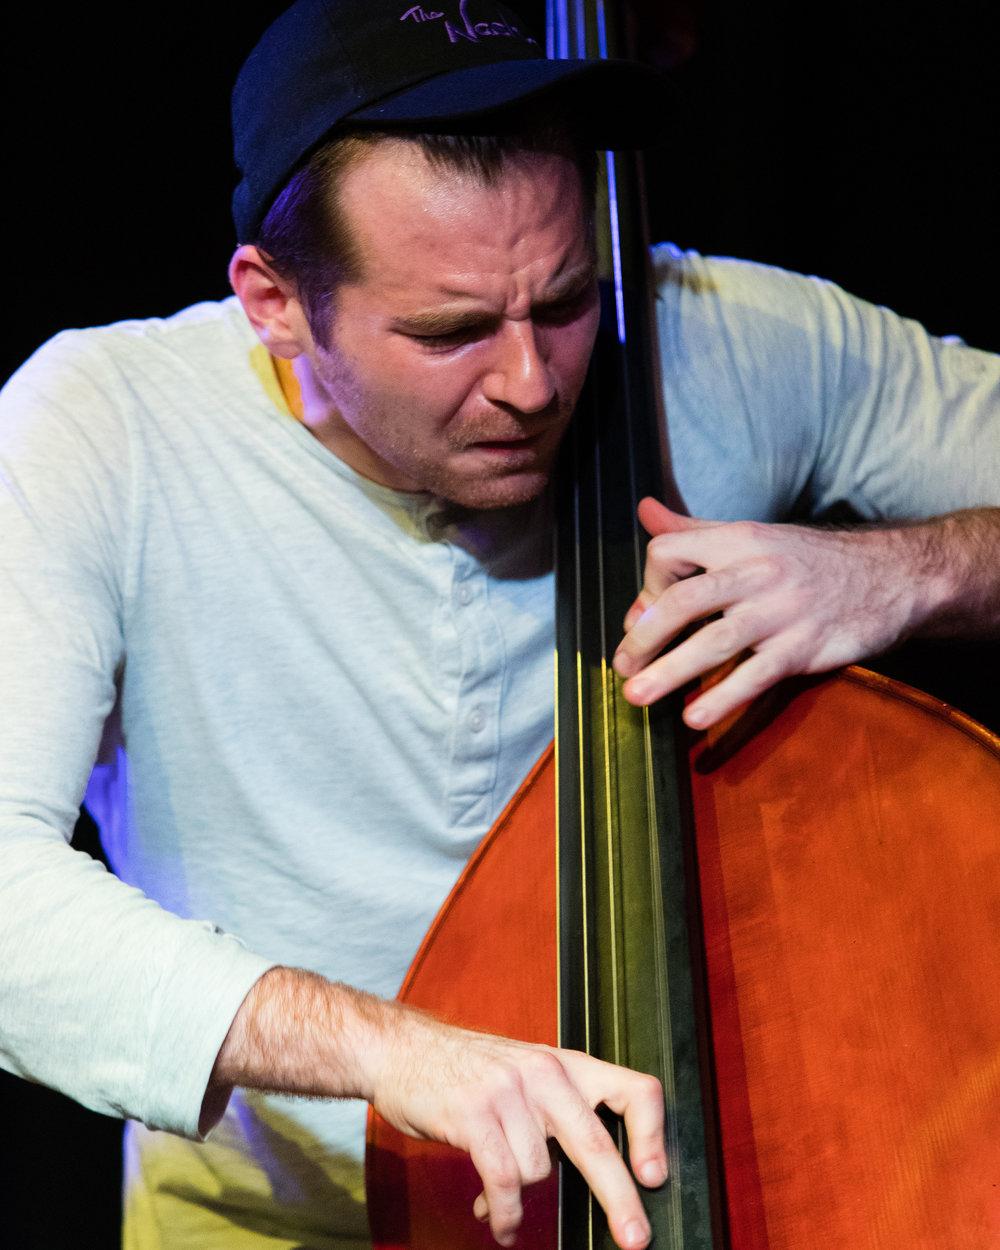 Alexander Claffy at The Nash Jazz Phoenix Sunday Jam Session - Joseph Berg Music Photography